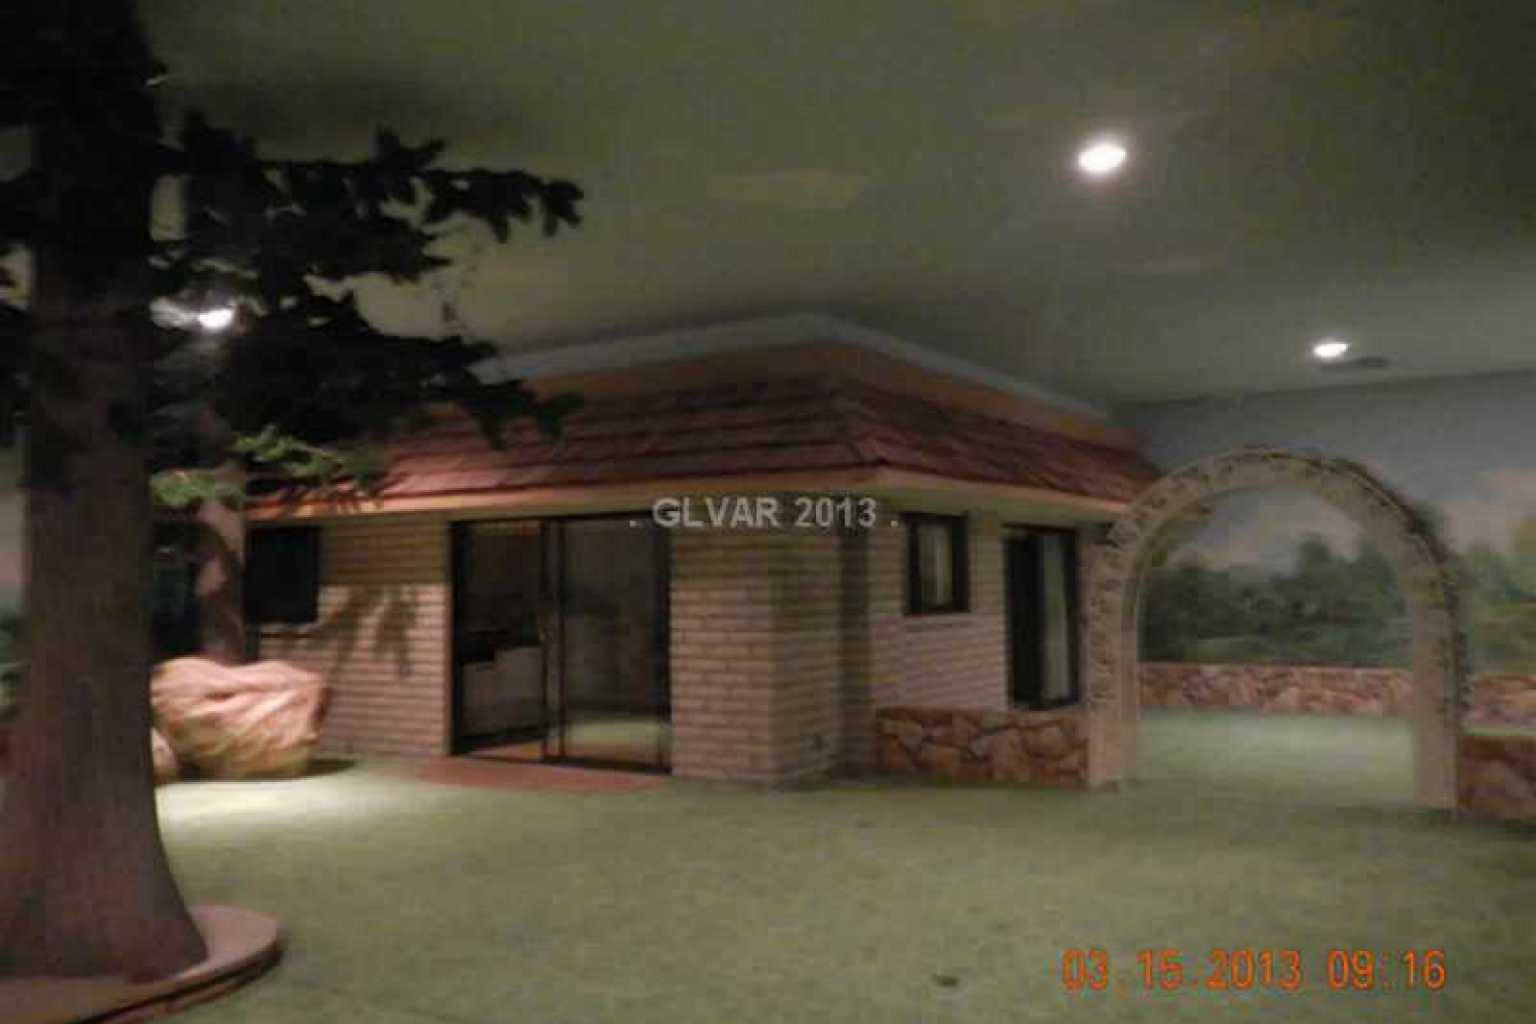 Underground 1970s Home Built 26 Feet Beneath Las Vegas Makes A Great Pad Fo